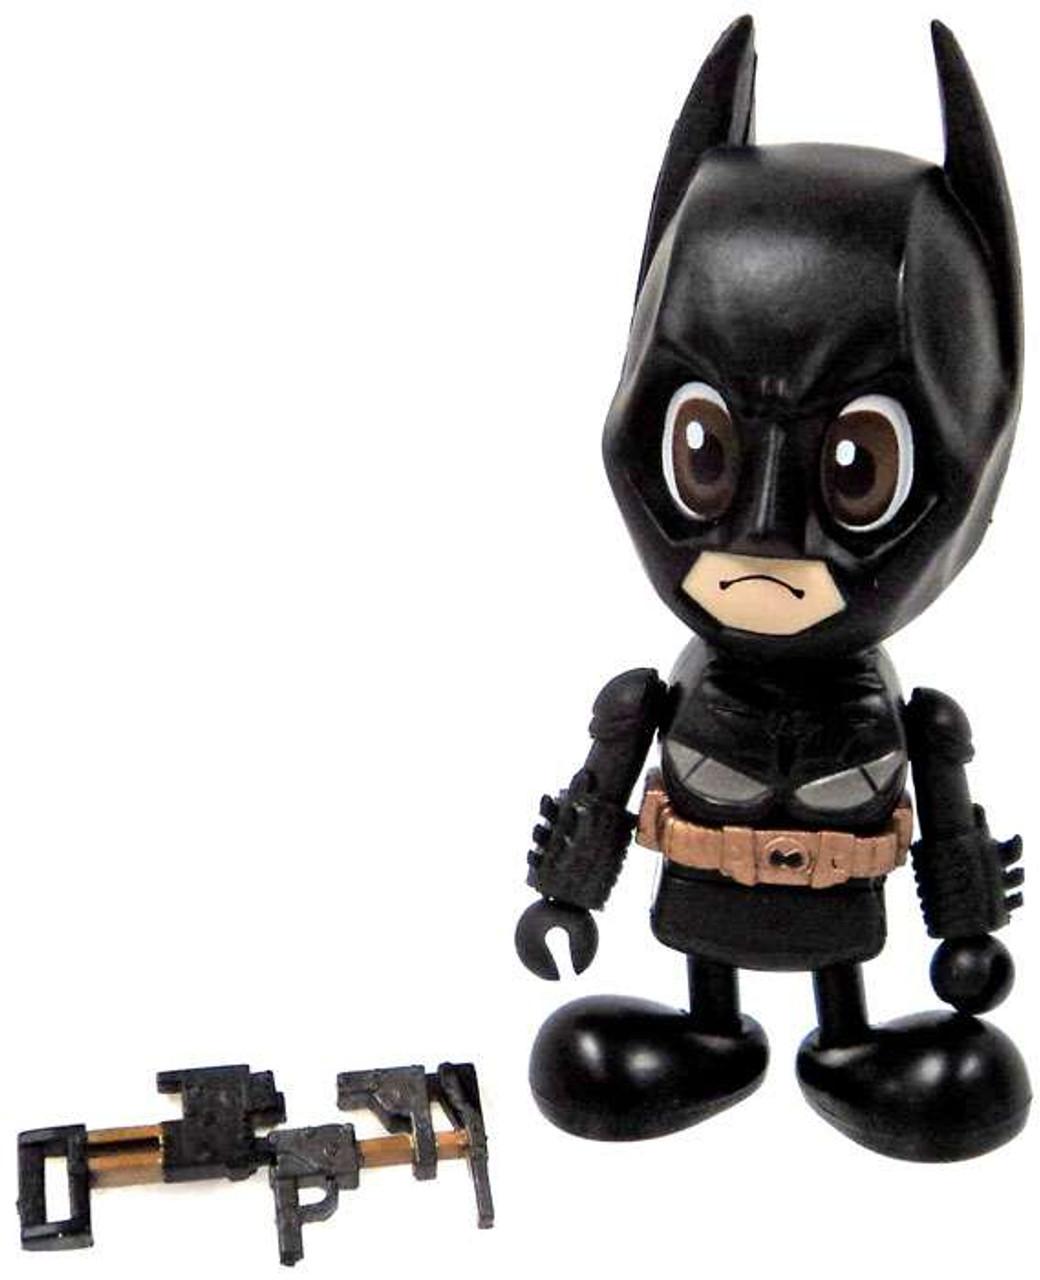 Batman Begins Cosbaby Batman 3-Inch Mini Figure